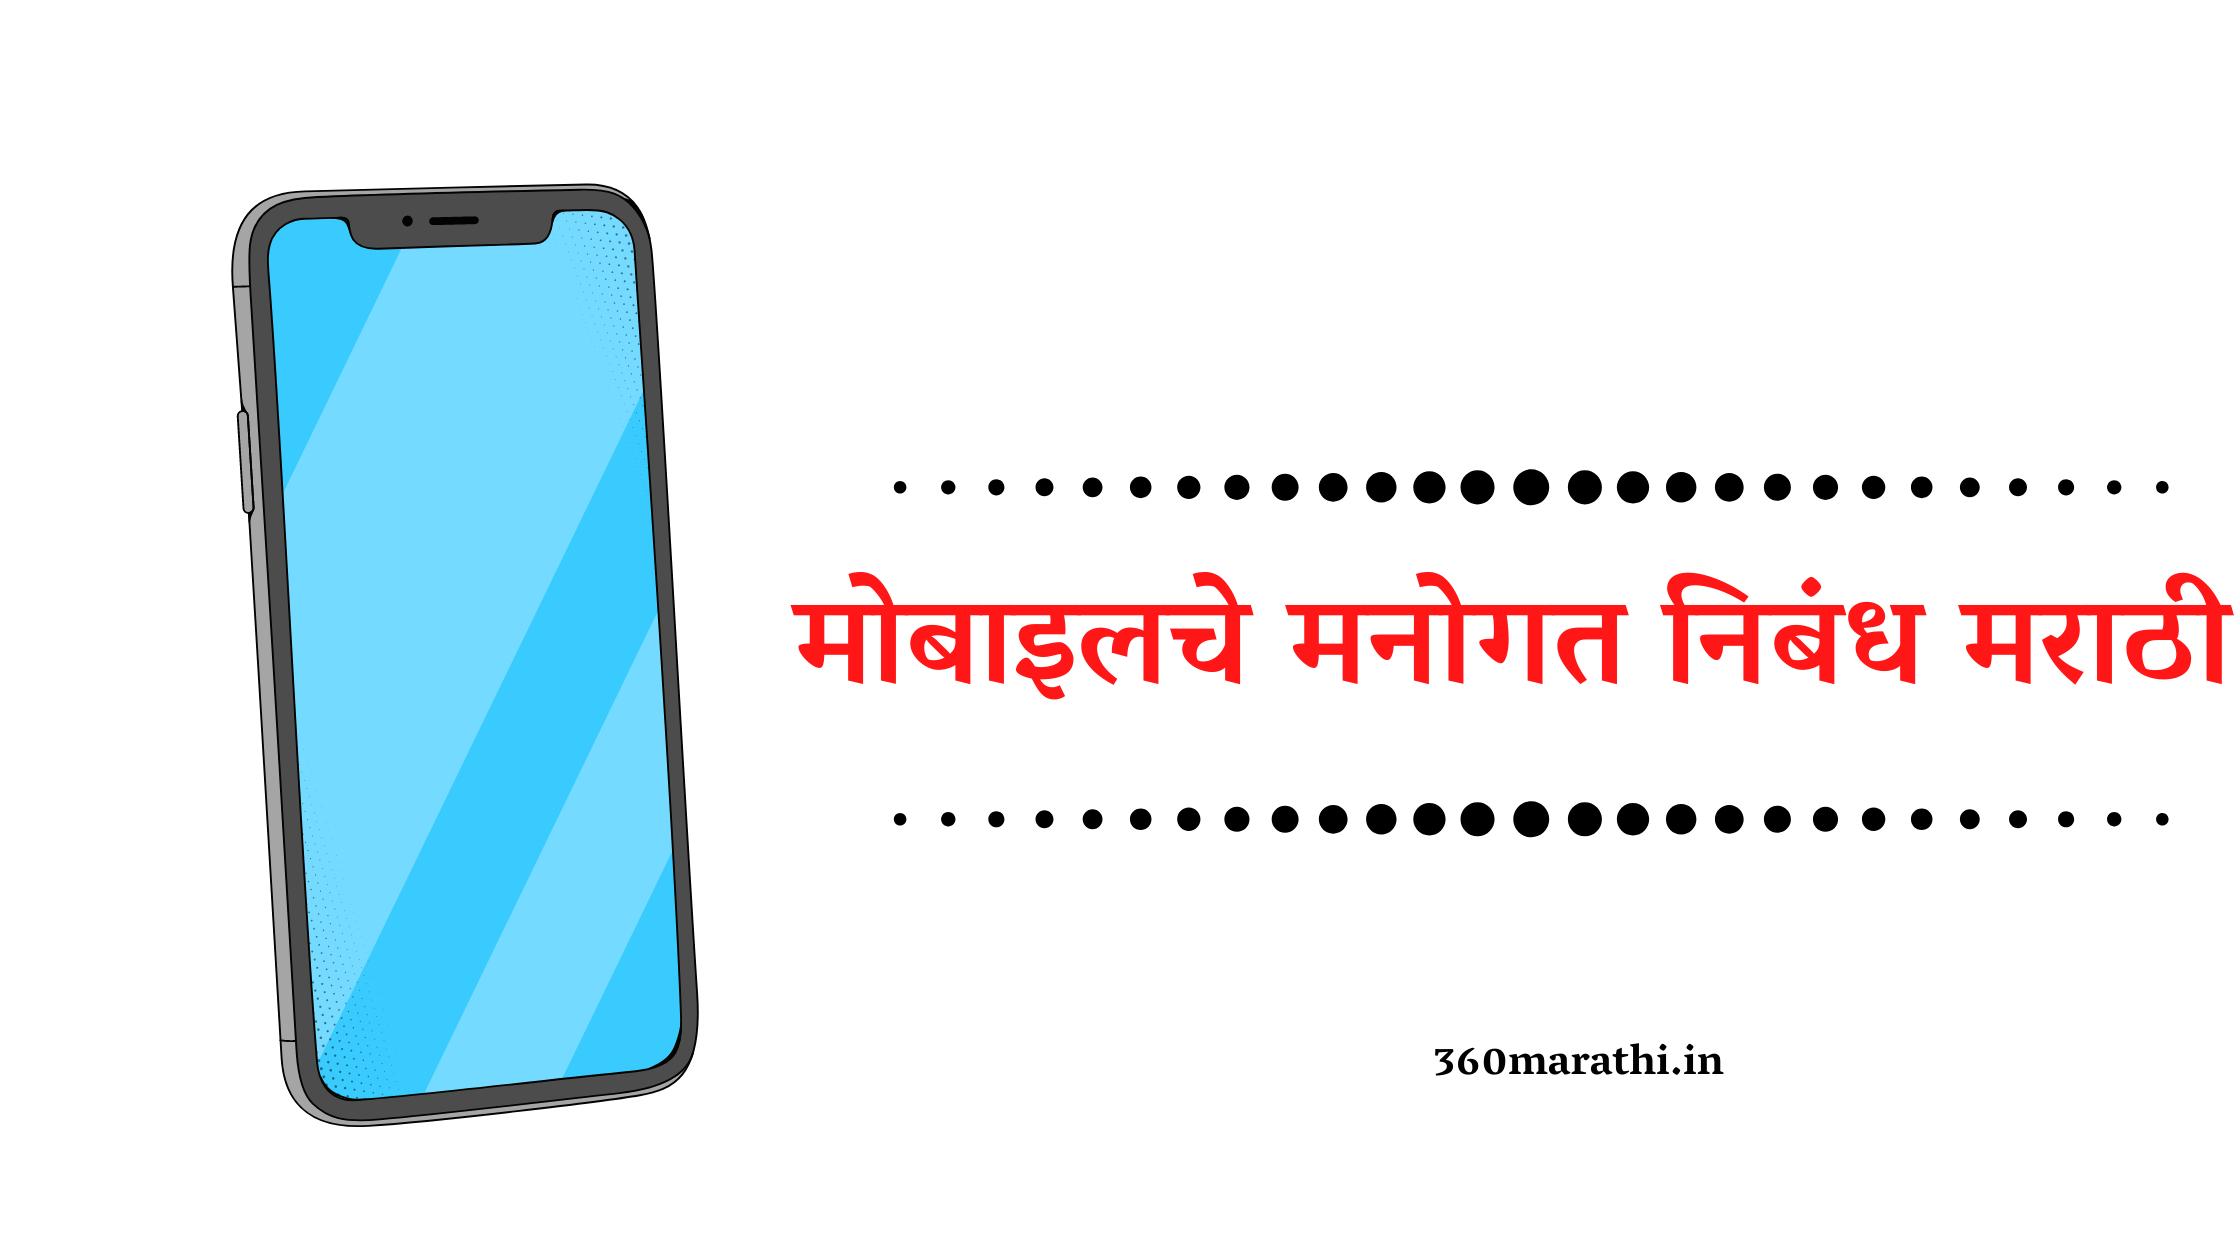 मोबाइलचे मनोगत निबंध मराठी   मोबाइलची  आत्मकथा निबंध मराठी   Mobile Che Manogat Essay in Marathi